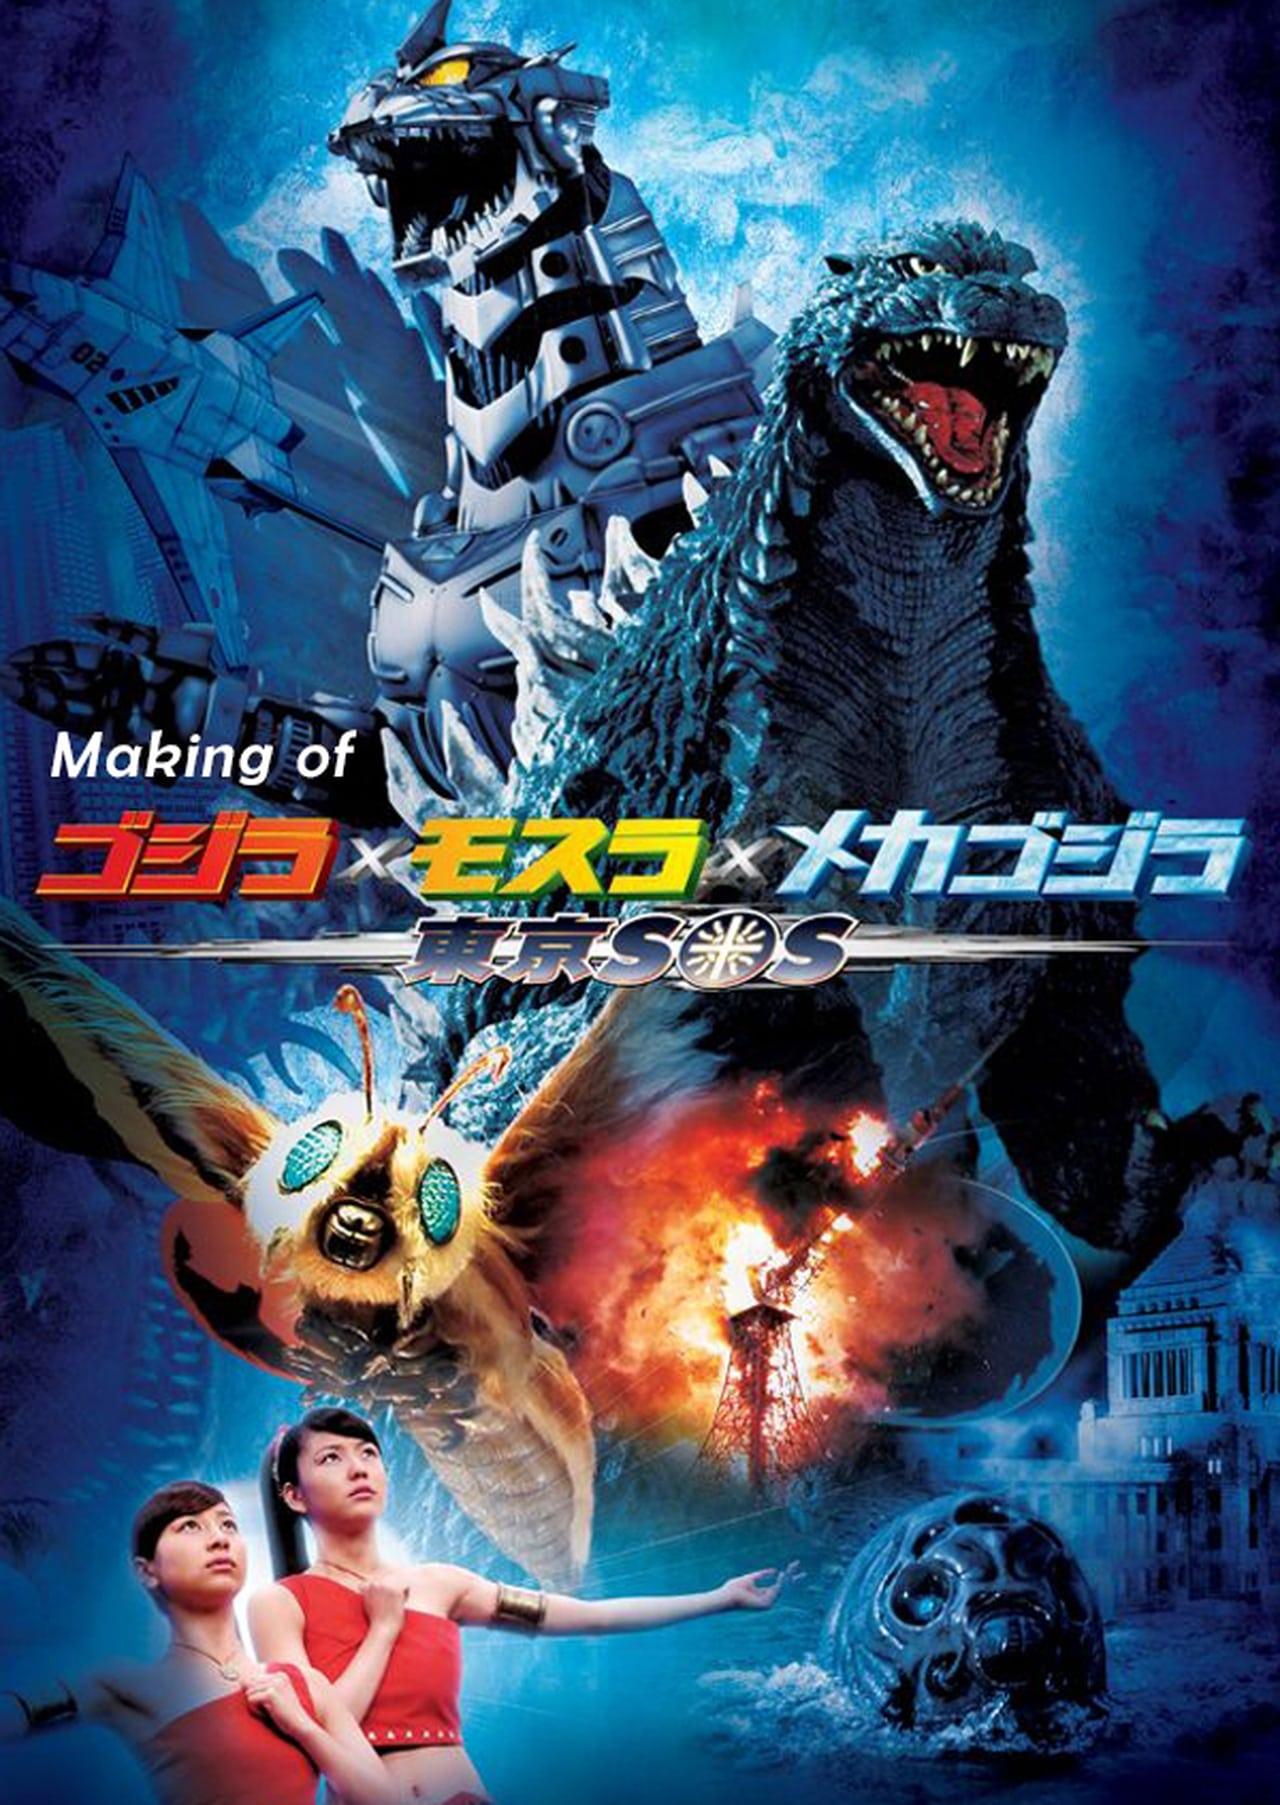 Making of Godzilla: Tokyo S.O.S.